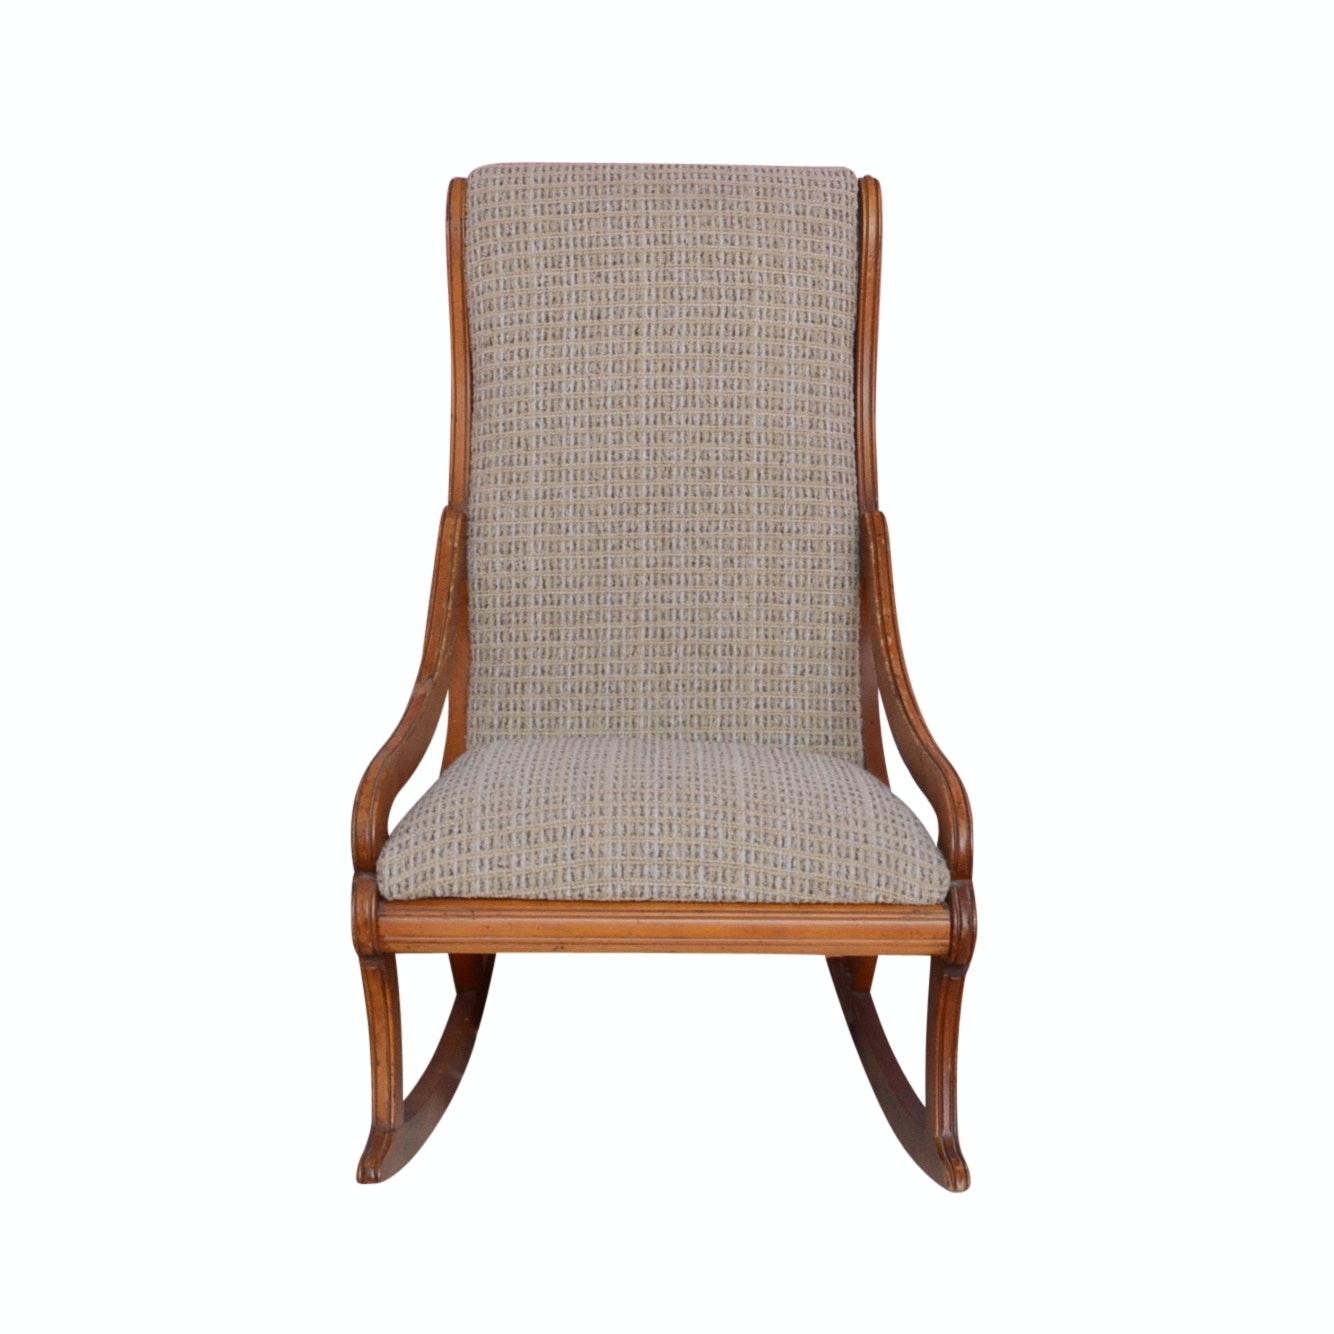 Vintage Upholstered Knitting Rocking Chair